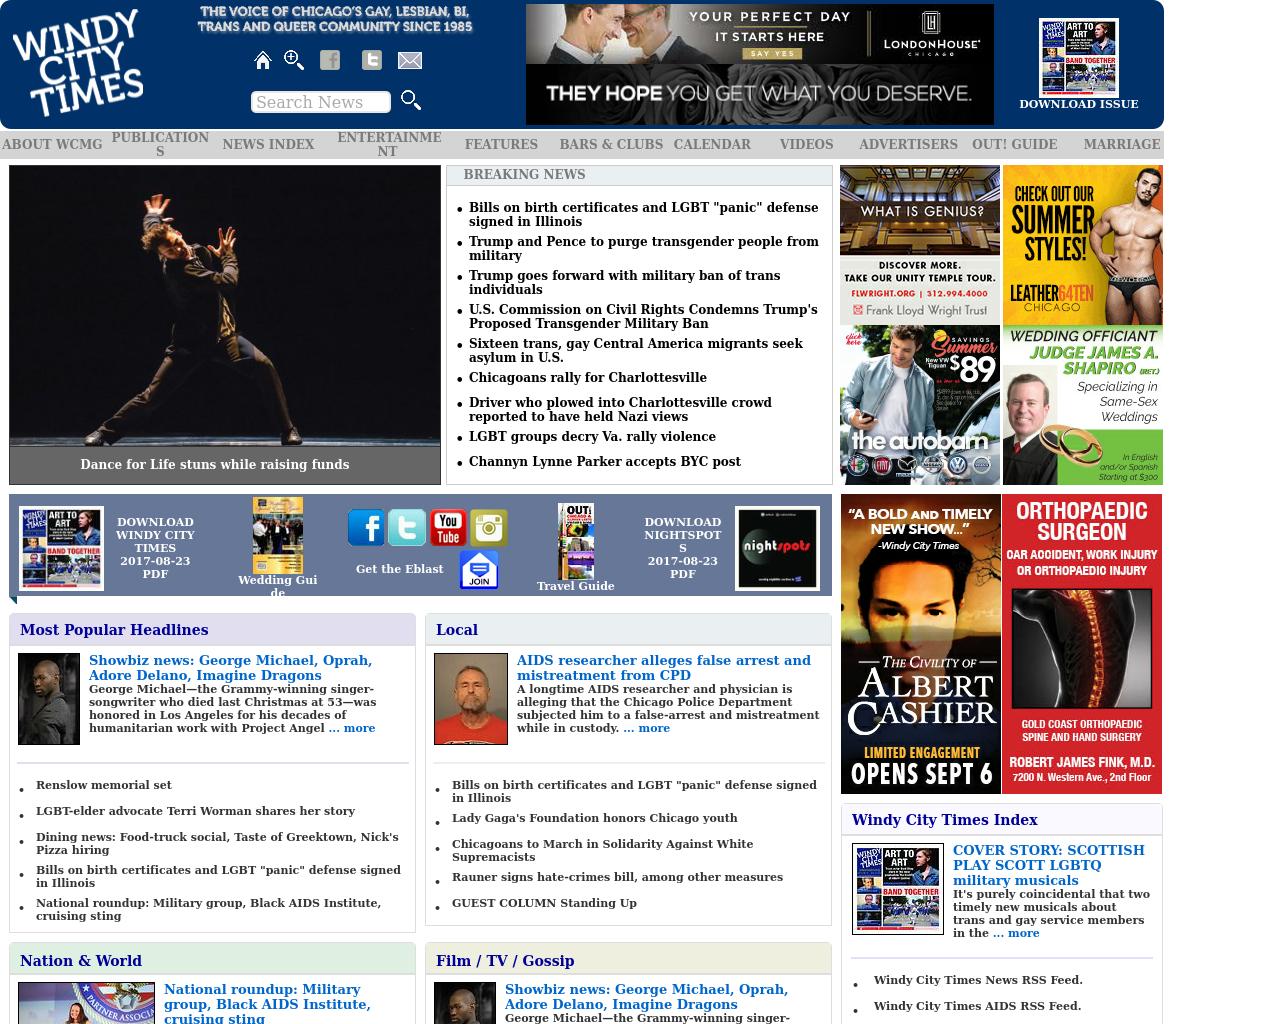 Windycitymediagroup-Advertising-Reviews-Pricing